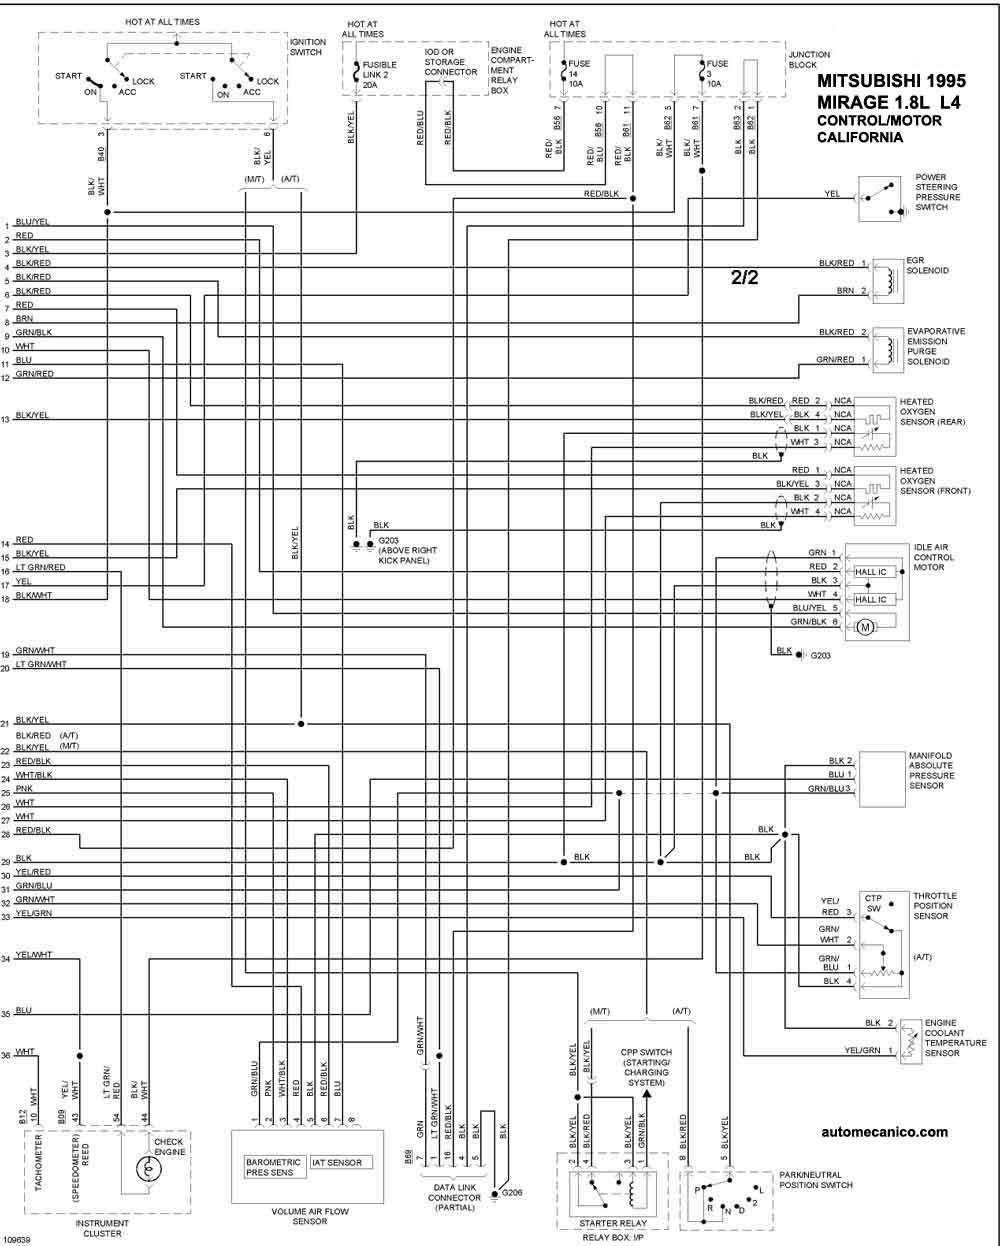 turbine sensor wiring diagram 1999 mitsubishi mirage